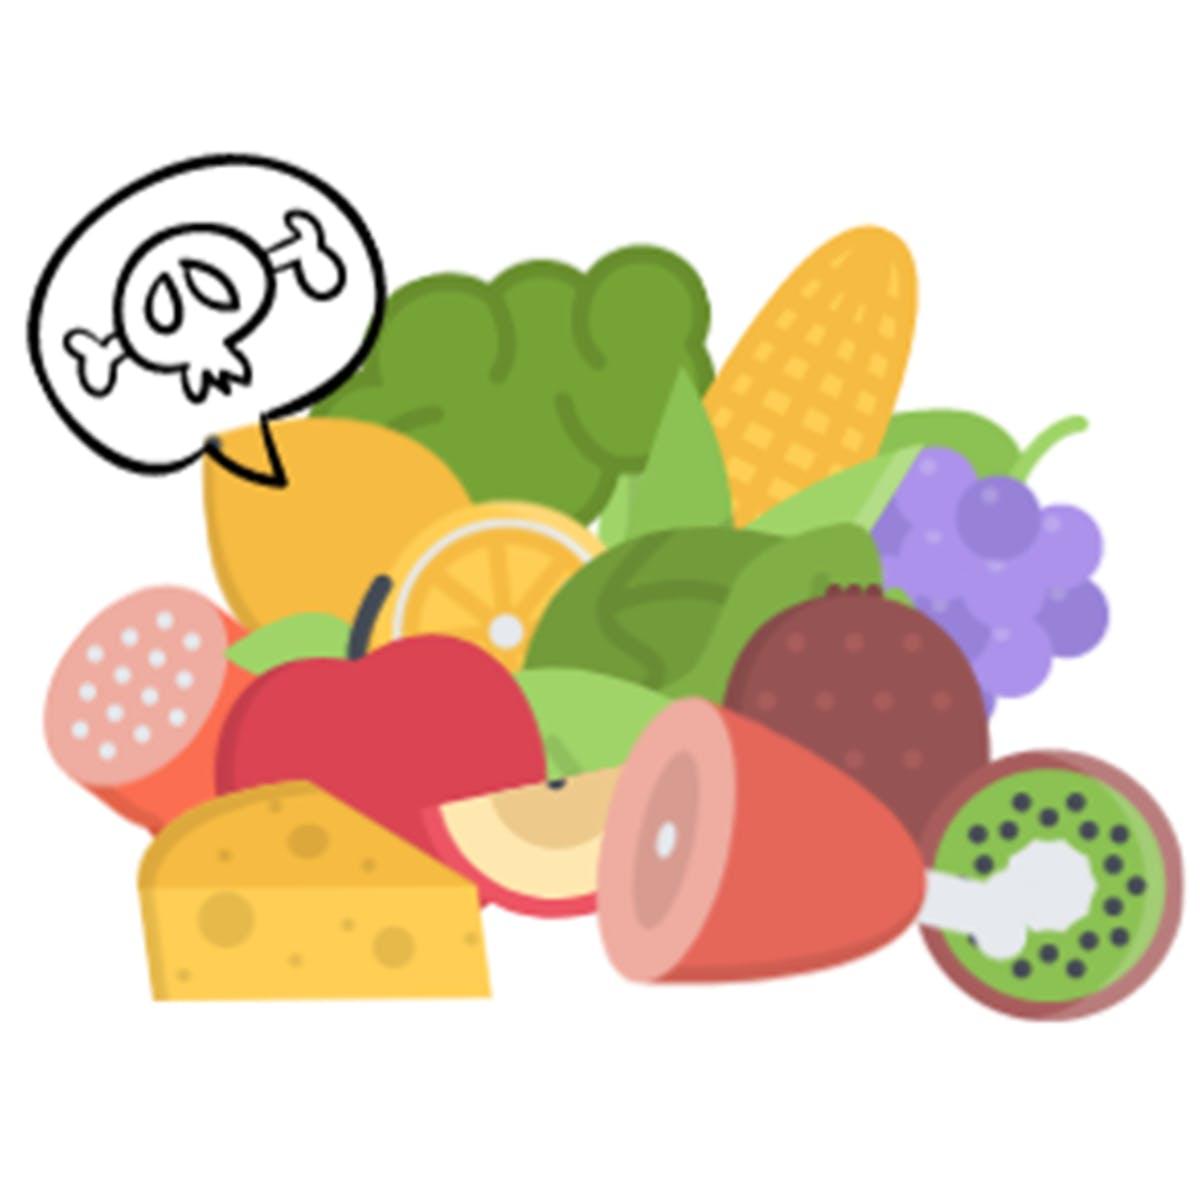 食品安全與風險分析(Food Safety&Risk Analysis)